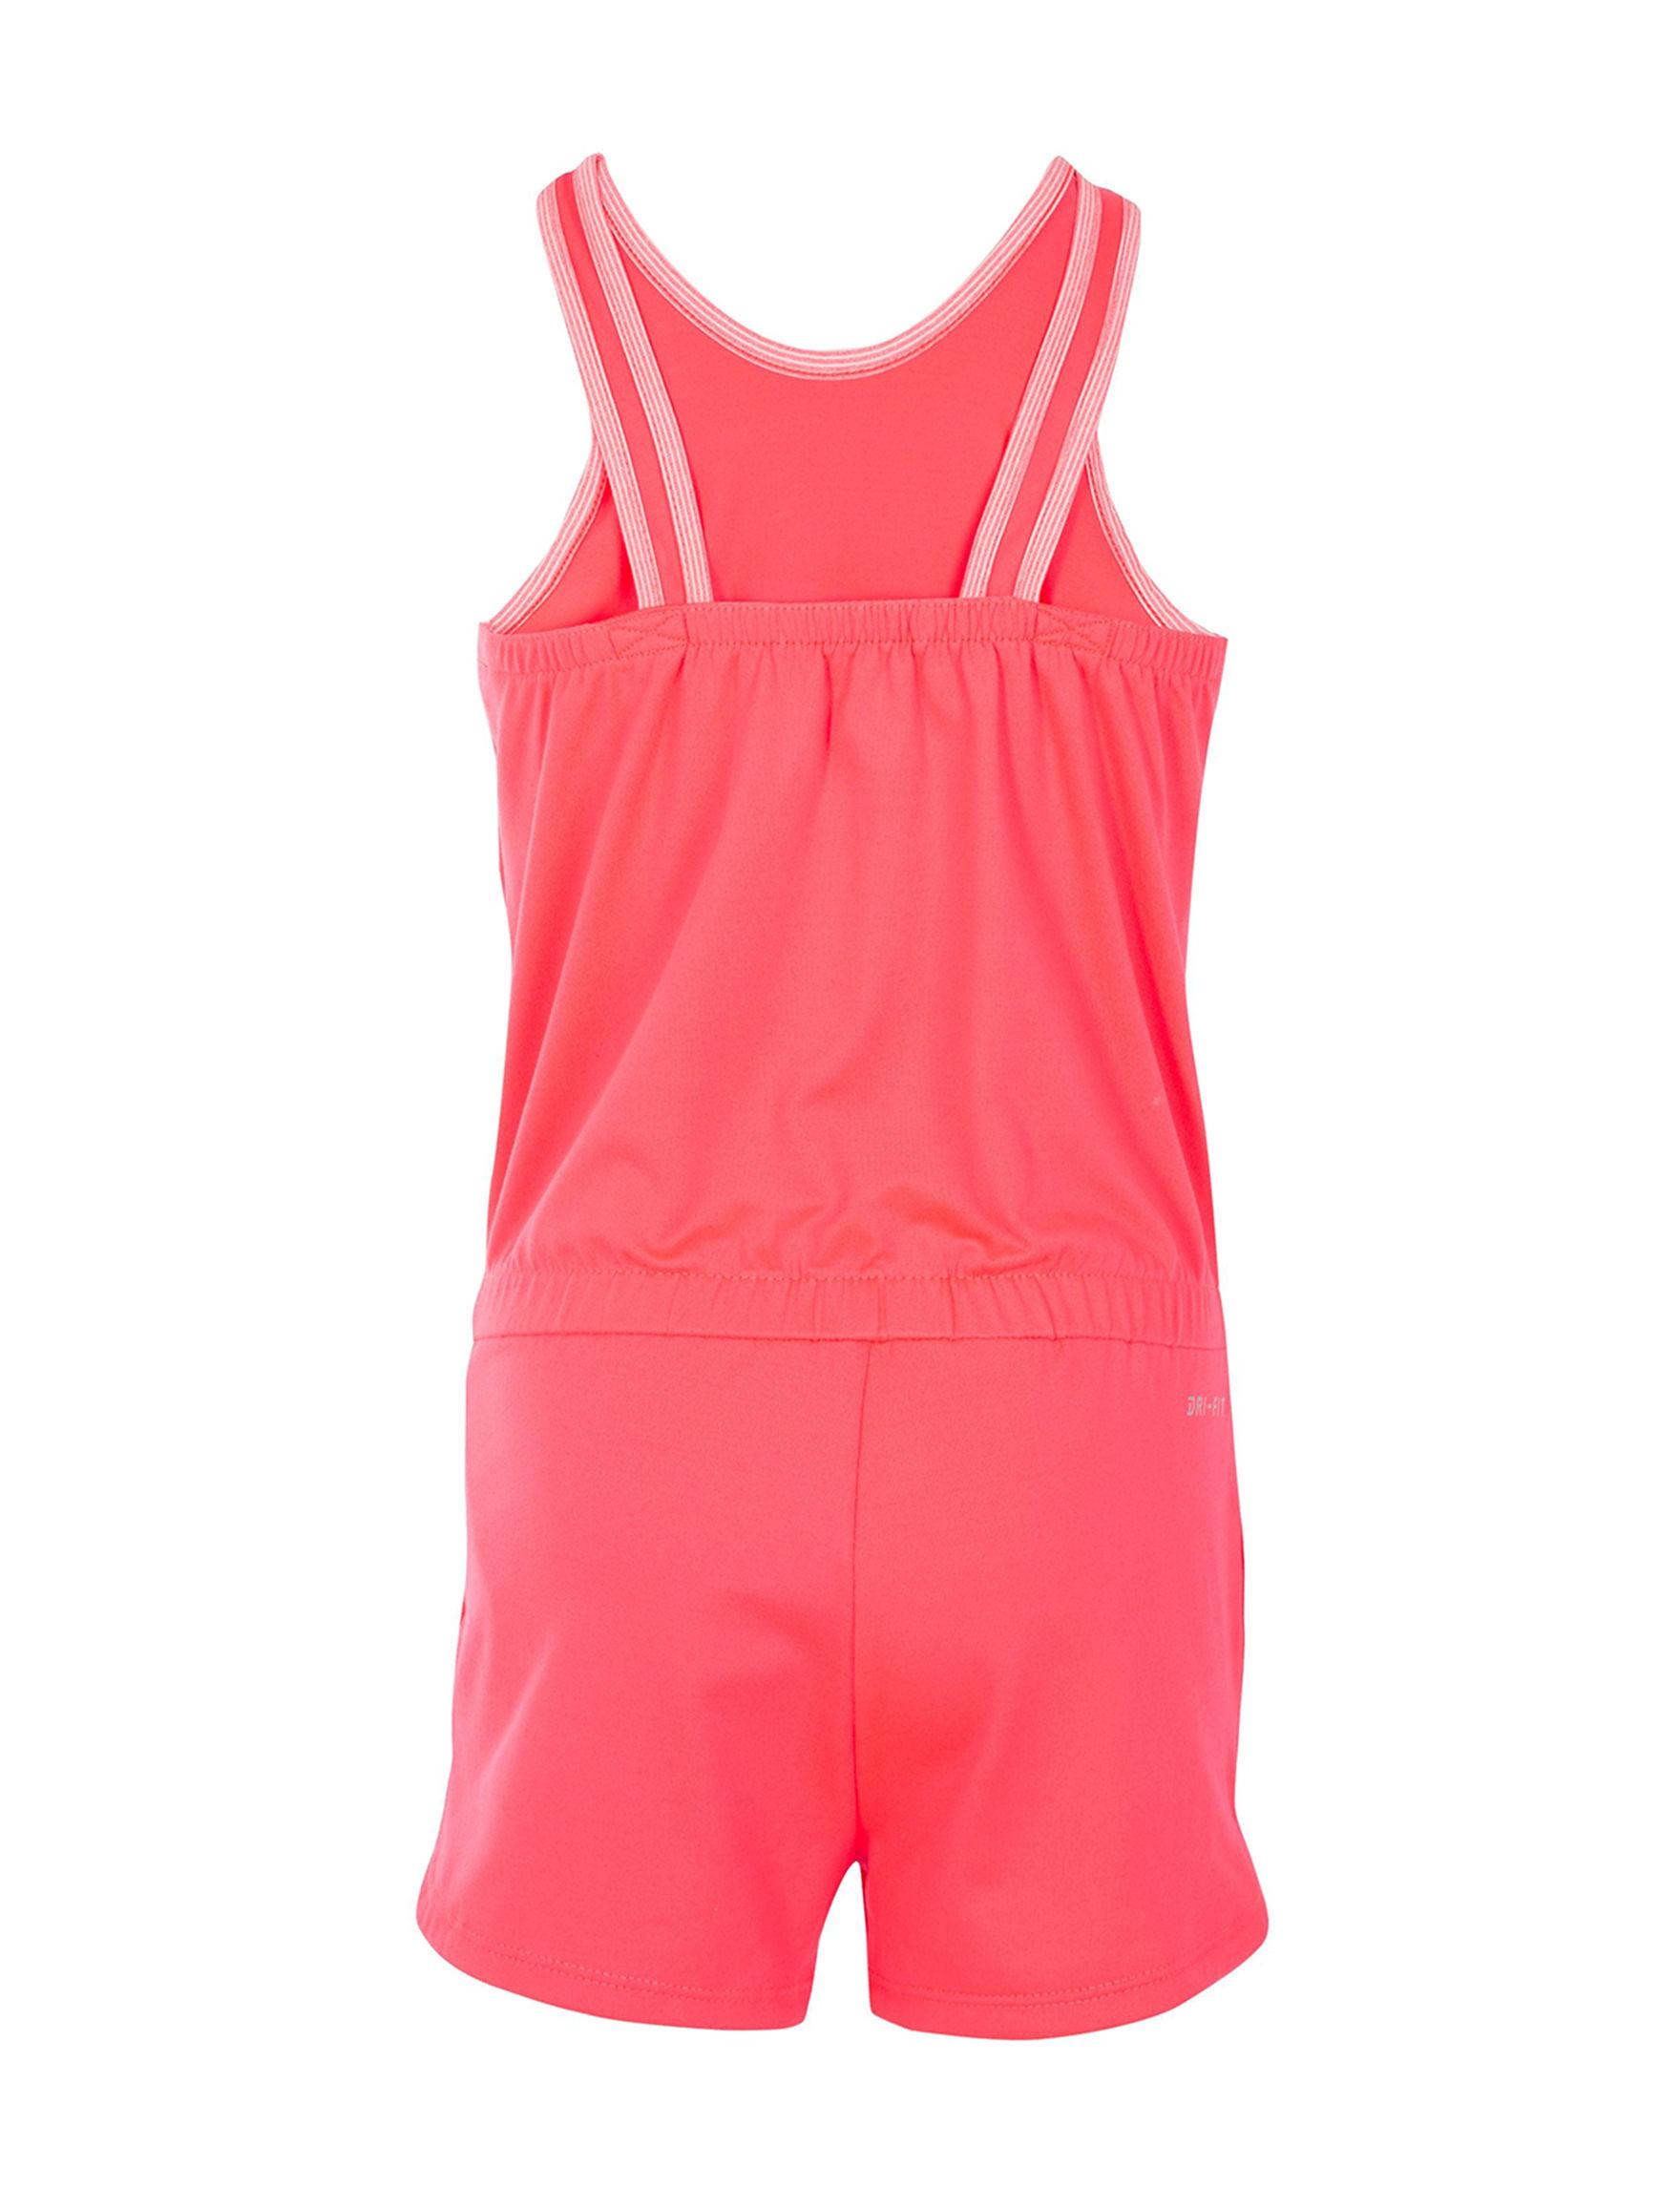 0f986c132dab Nike Dry Swoosh Logo Essentials Romper - Toddlers   Girls 4-6x ...